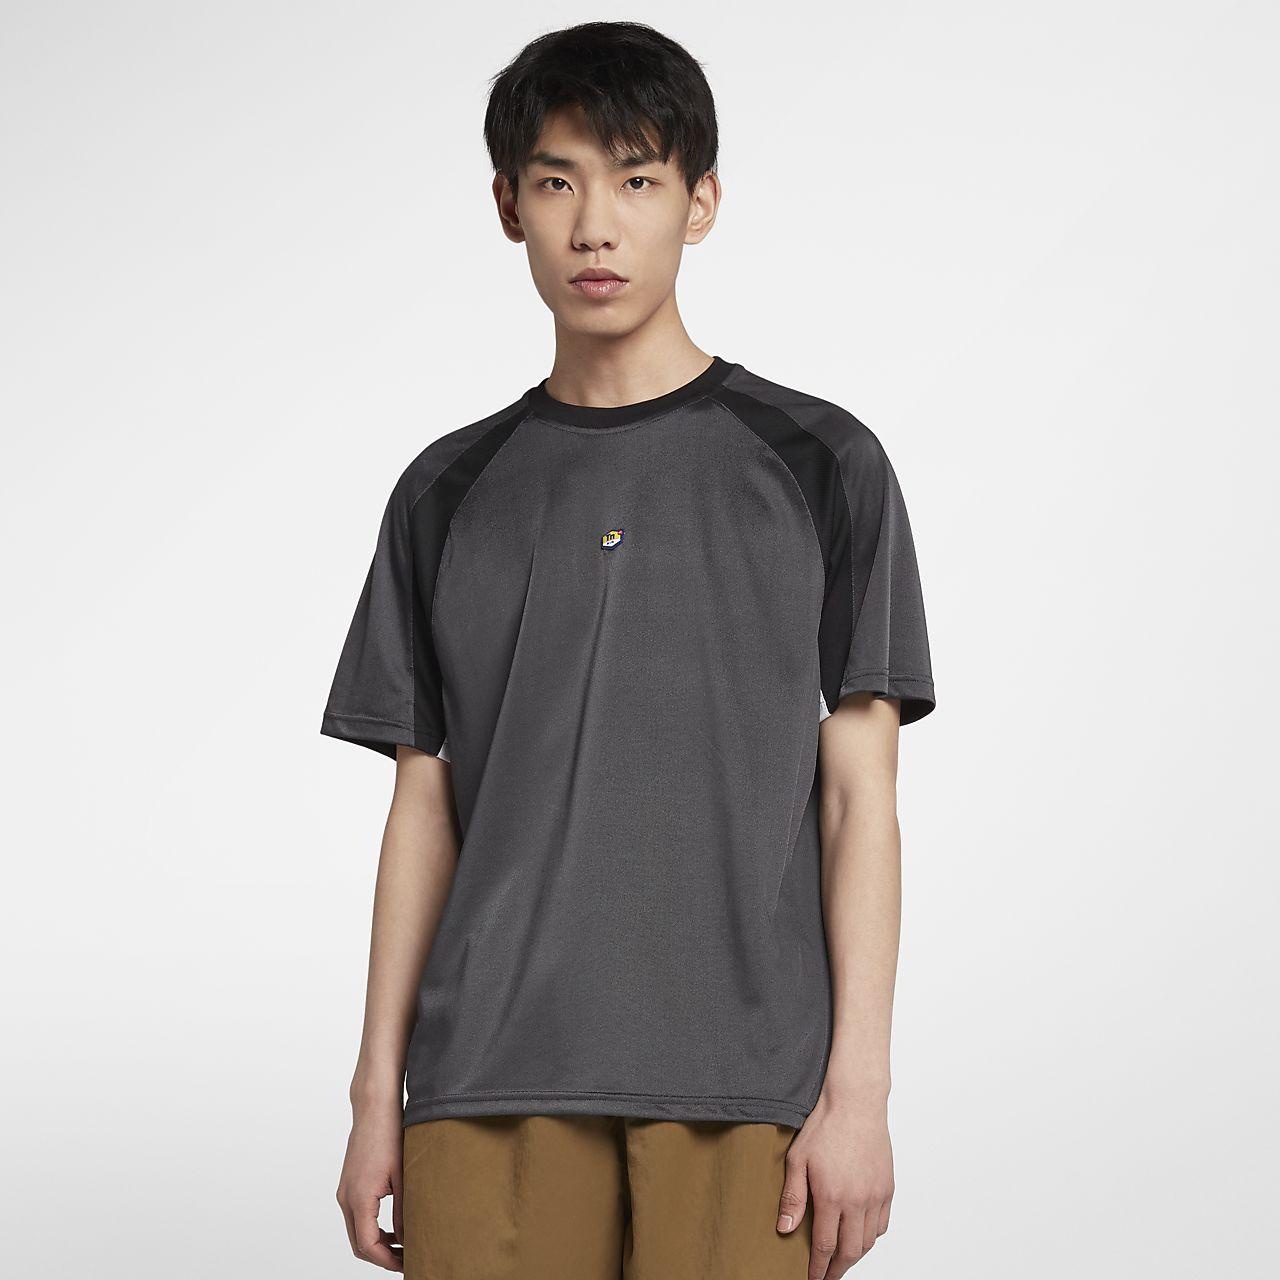 Camisola de manga curta NikeLab Collection Tn para homem